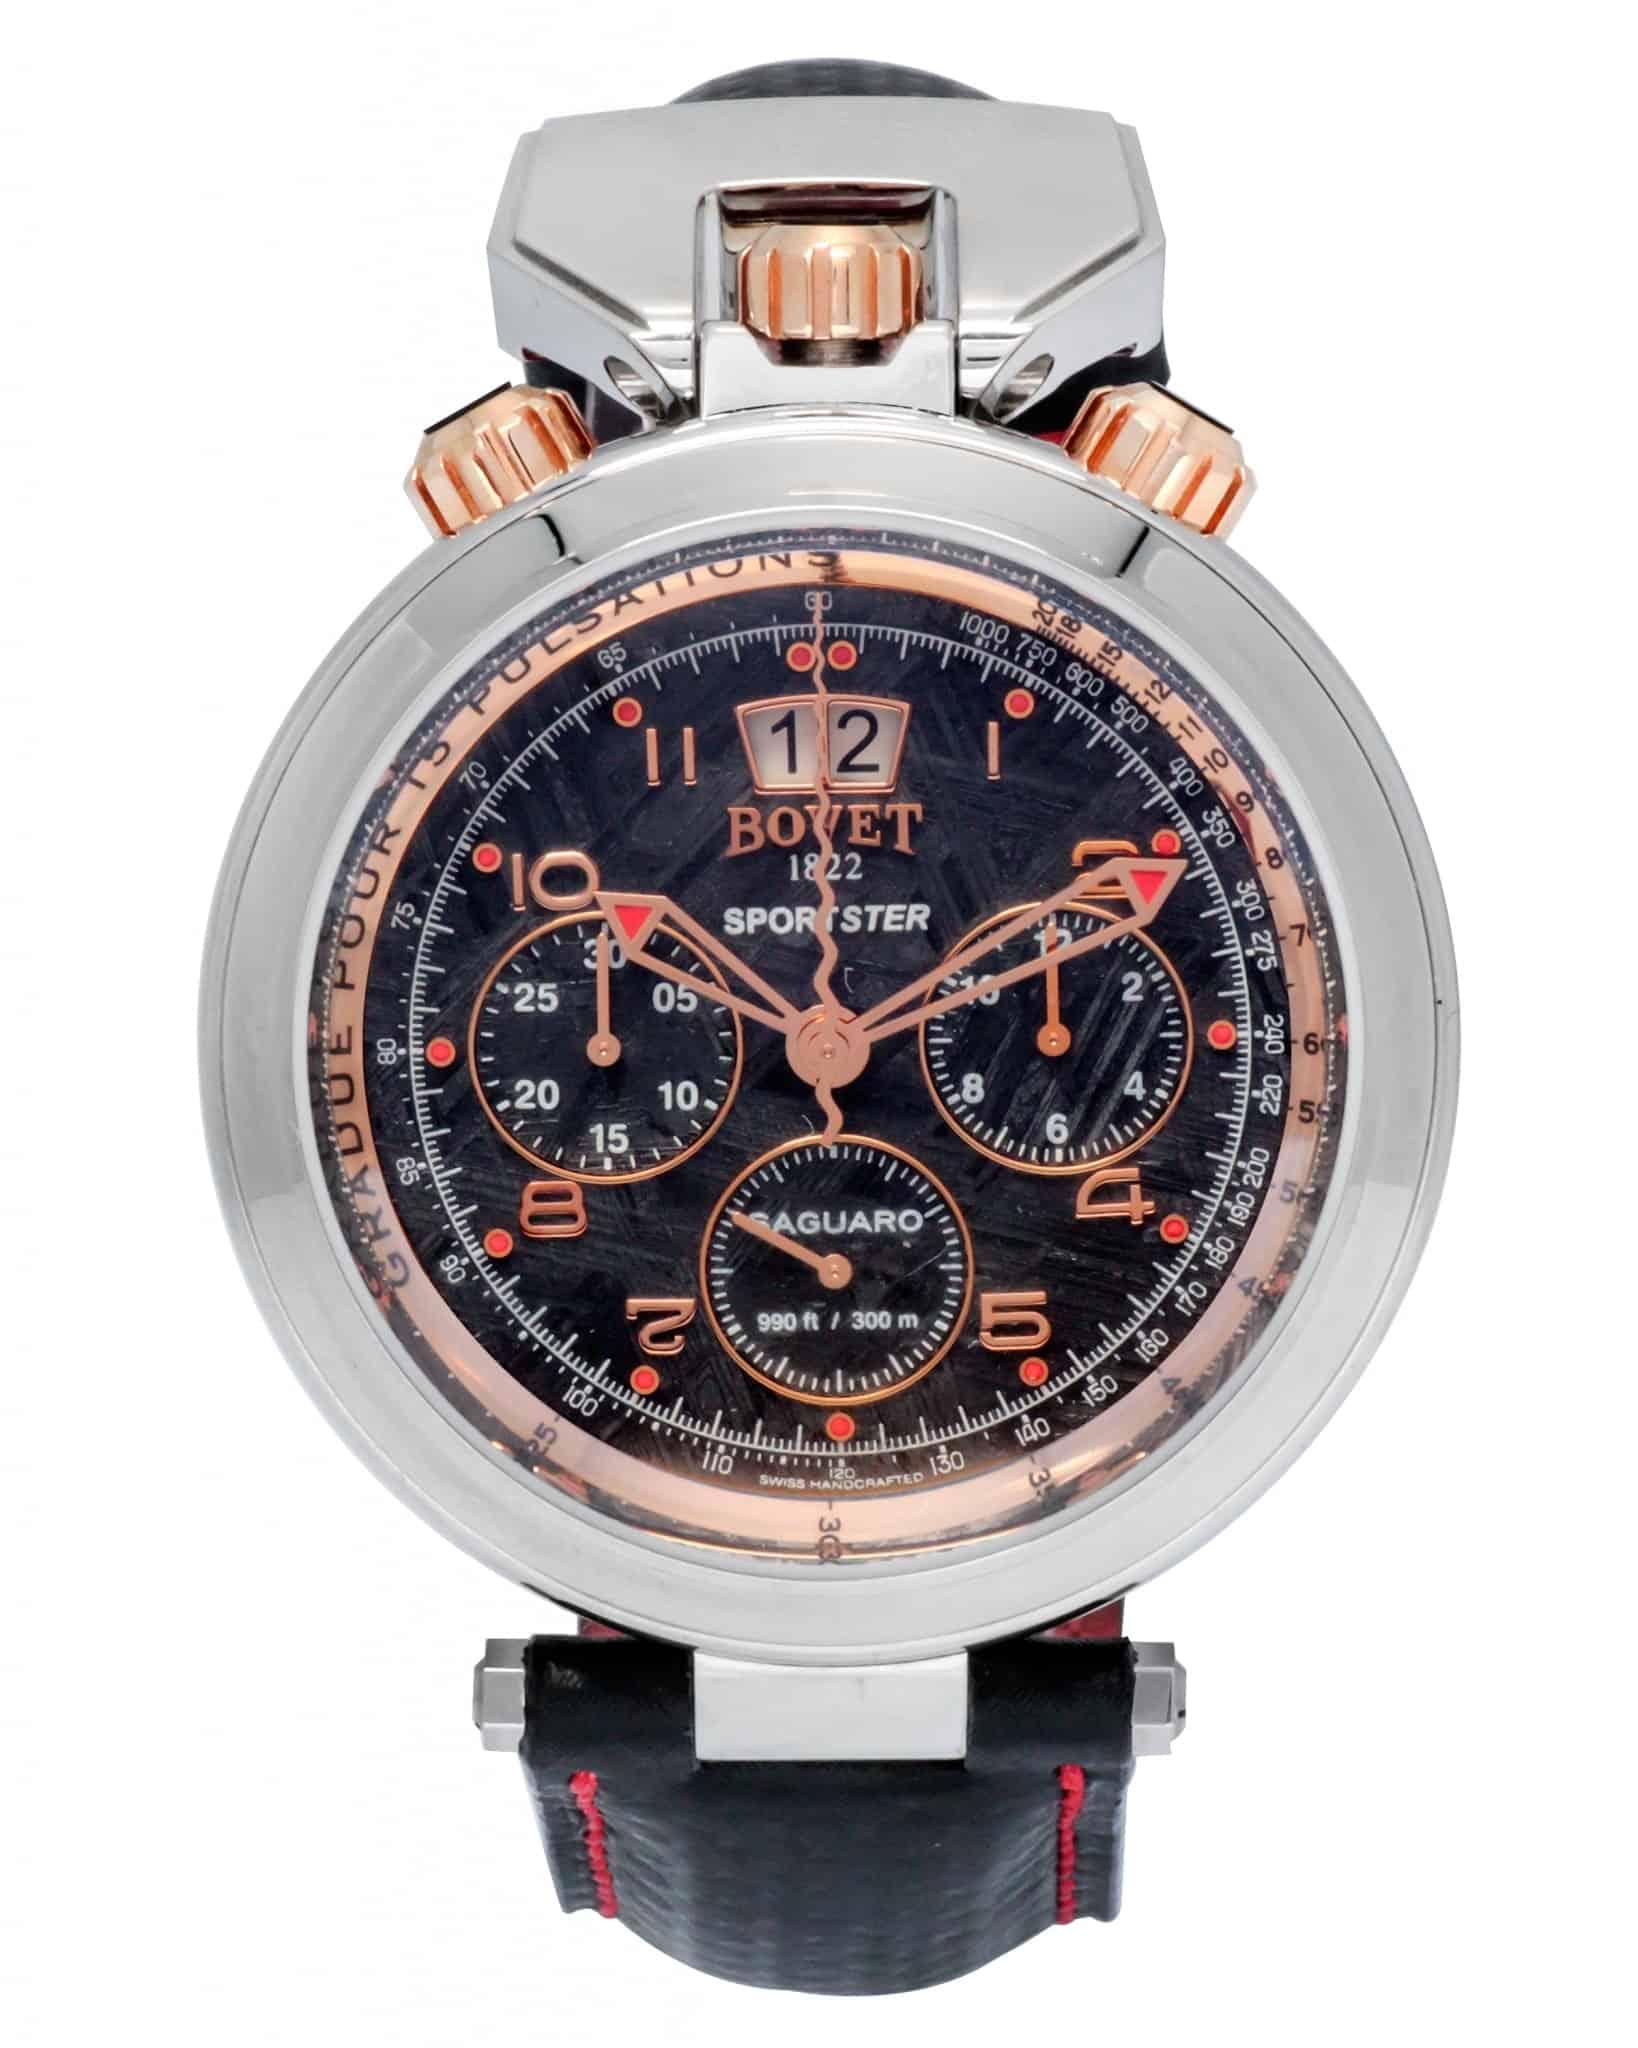 Bovet Sportster Saguaro Big Date Chronograph Automatic Men's Watch – SP0392